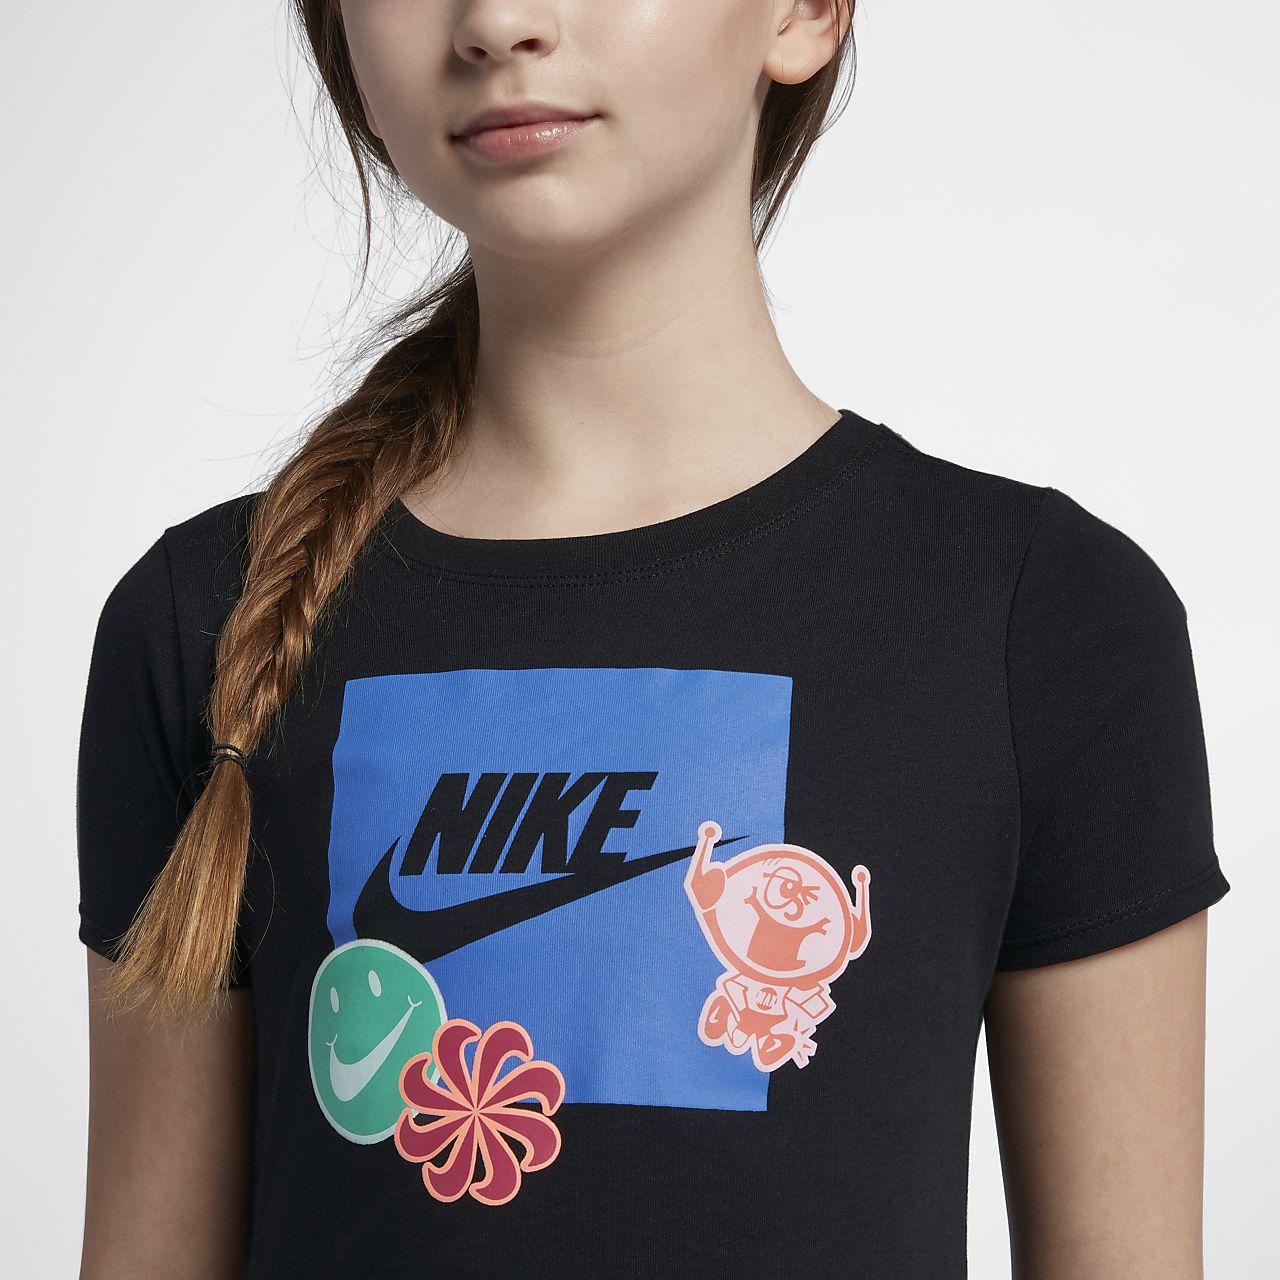 nike 146 mädchen shirt